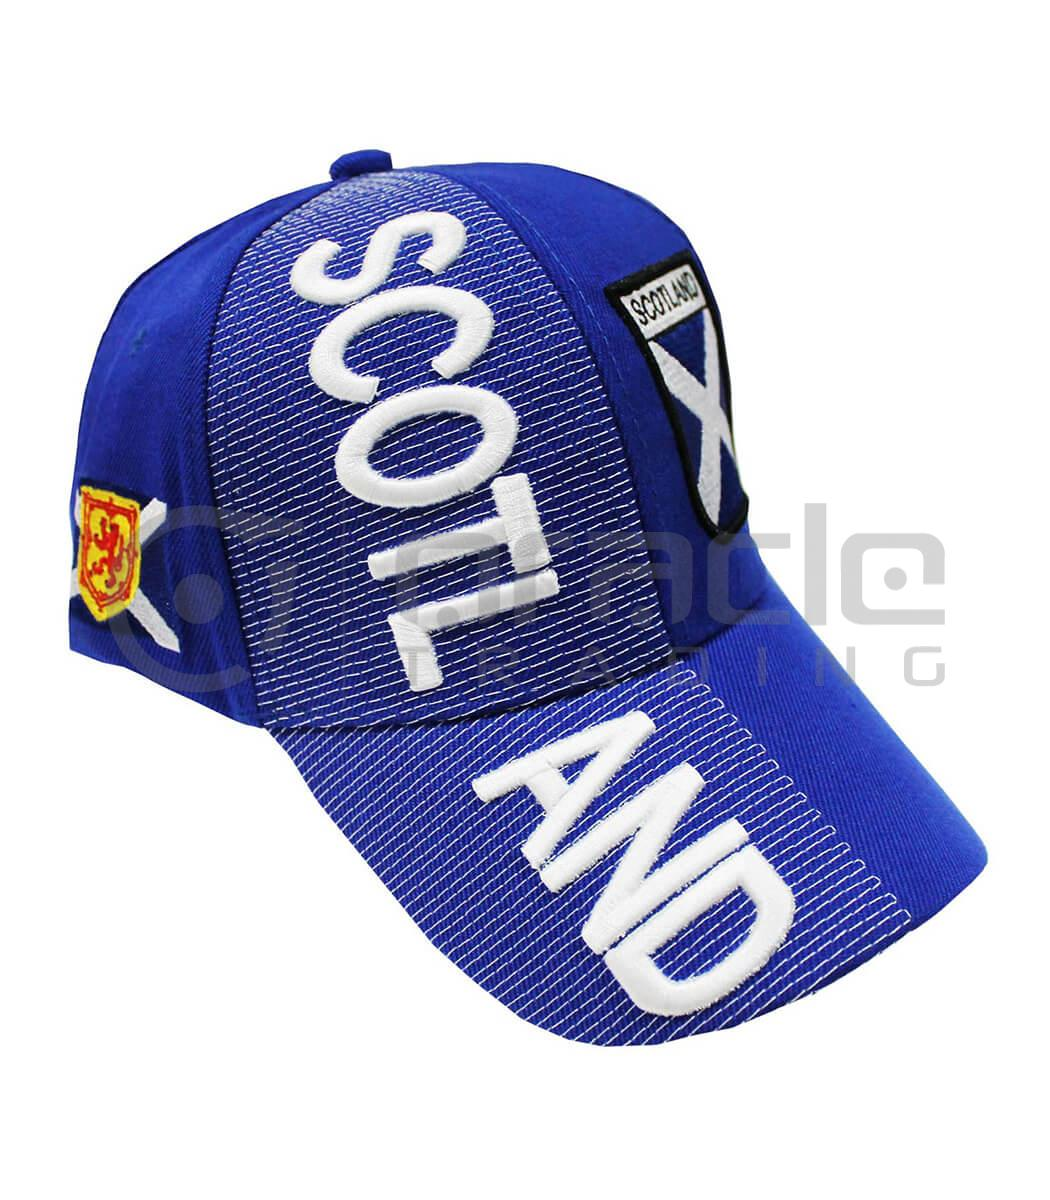 3D Scotland Hat   St. Andrewu0027s Cross